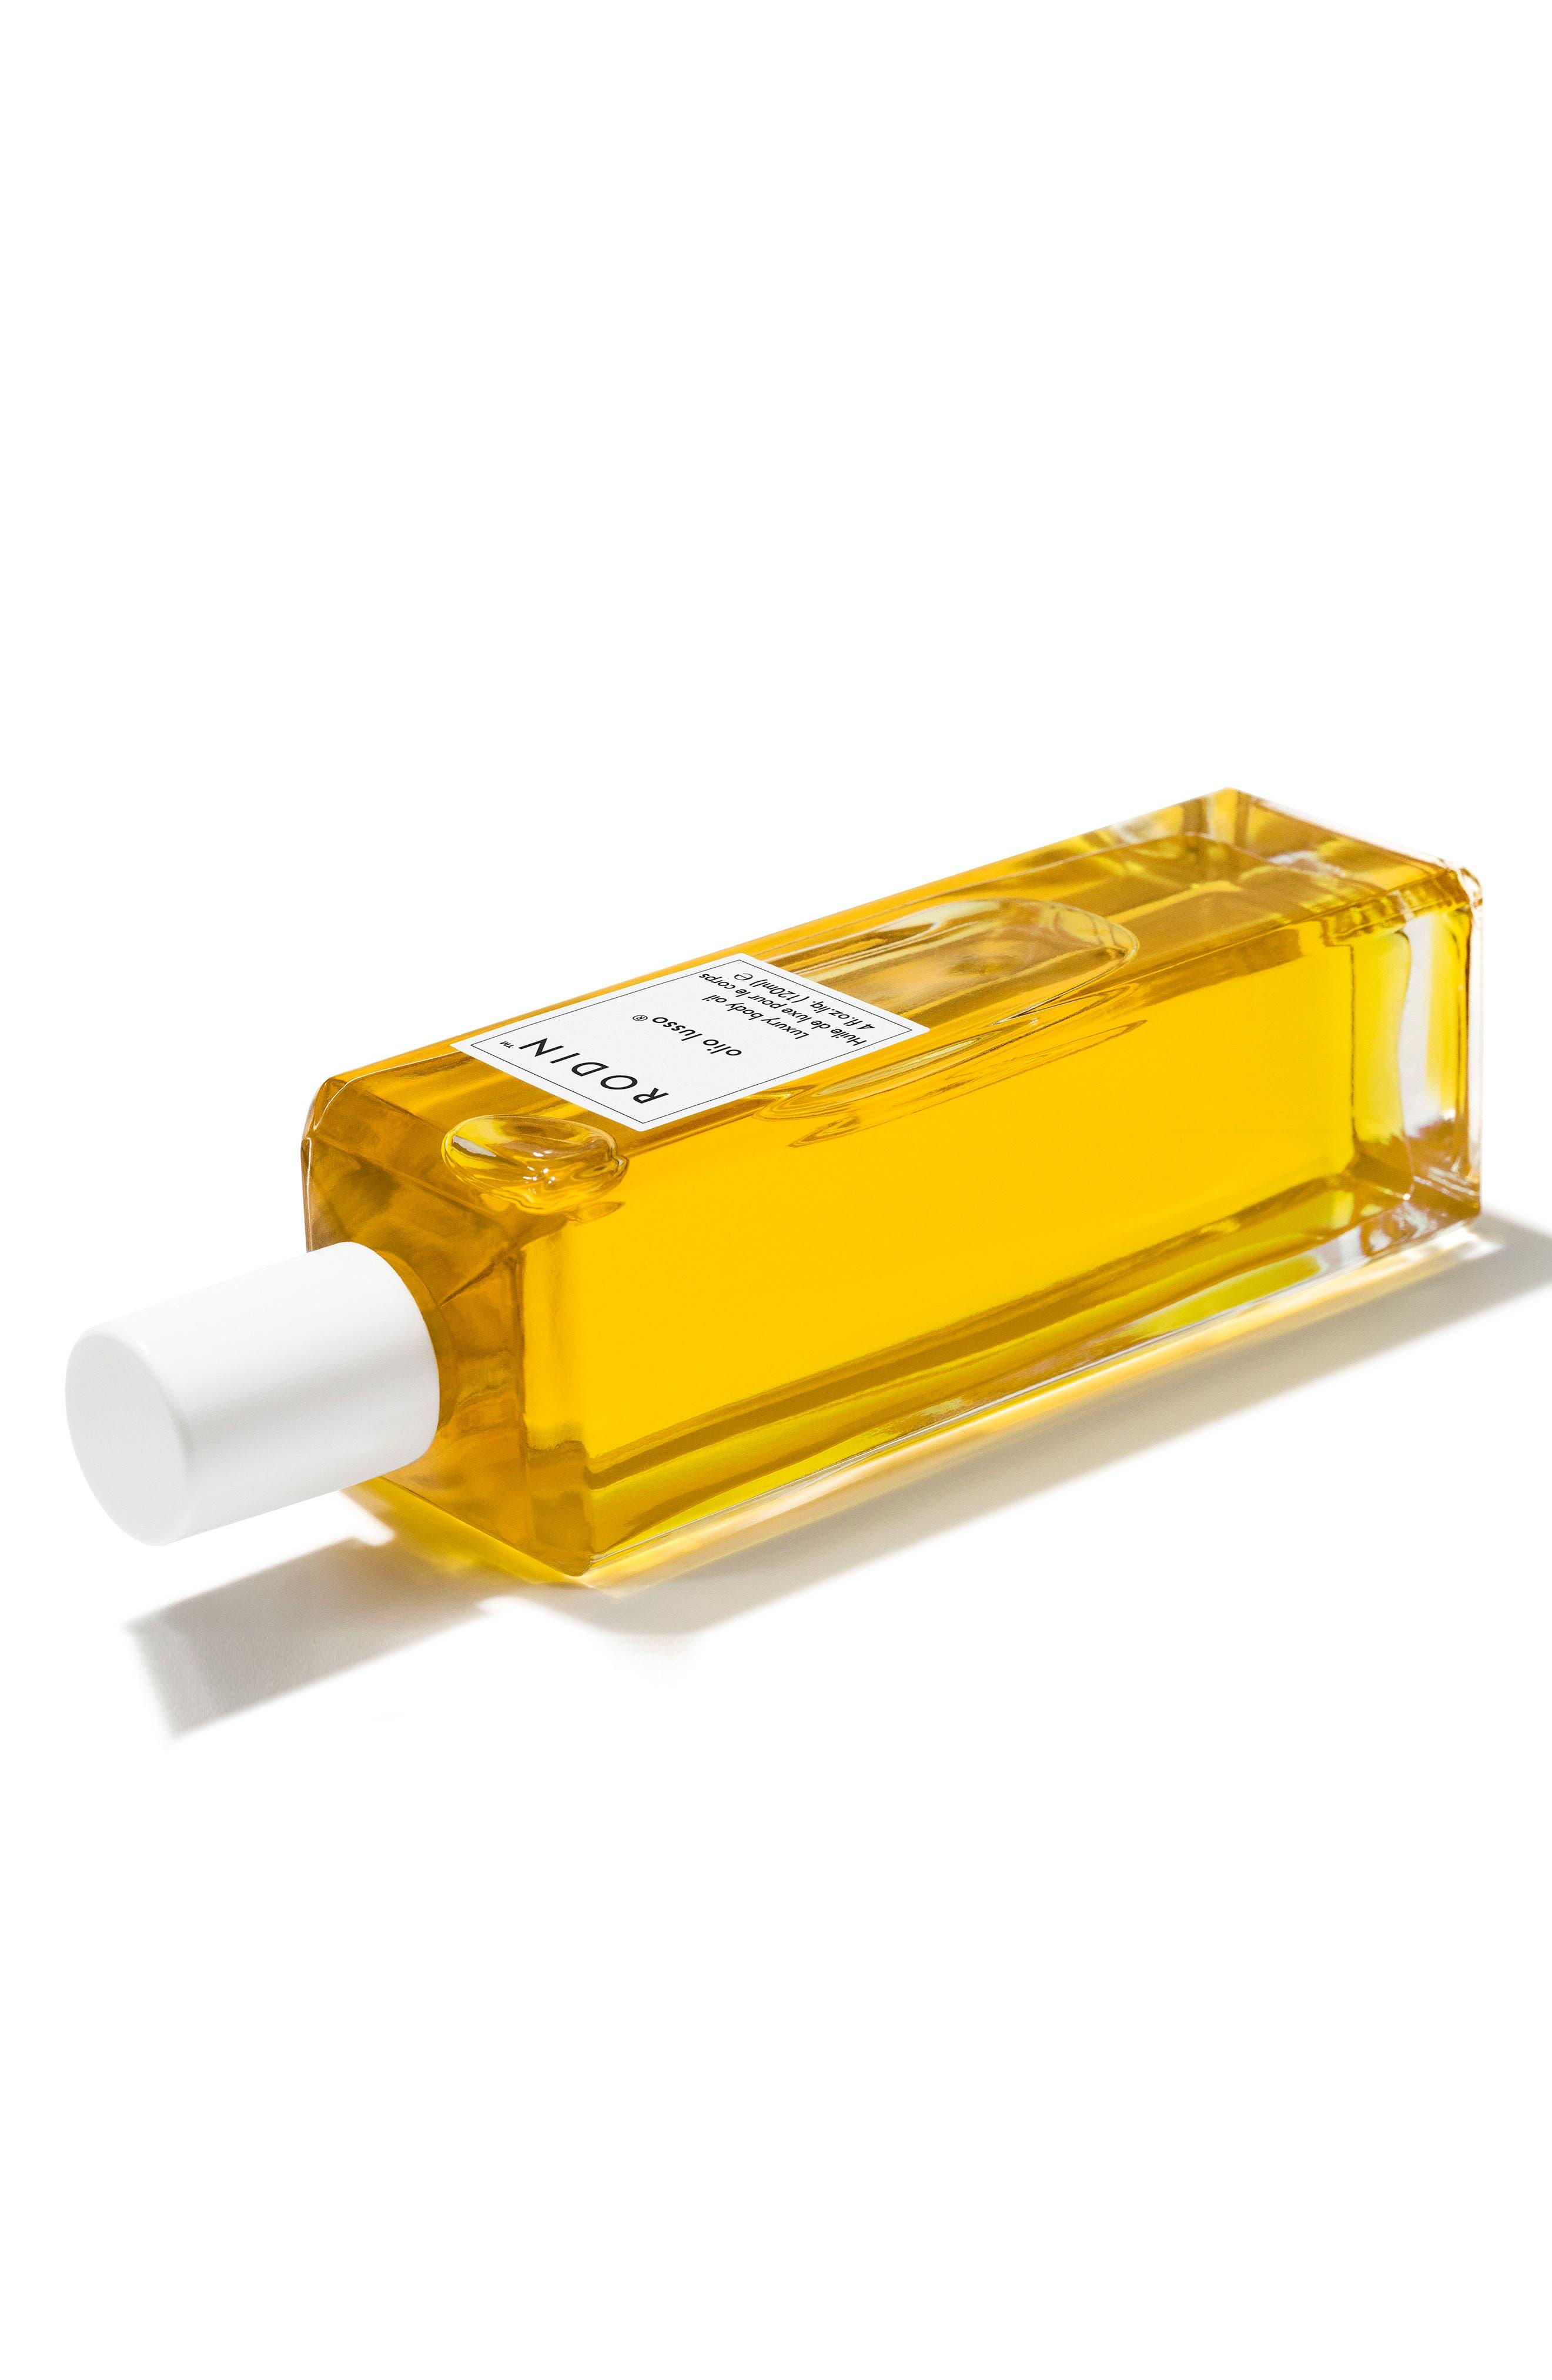 Jasmine/Neroli Body Oil,                             Alternate thumbnail 3, color,                             No Color